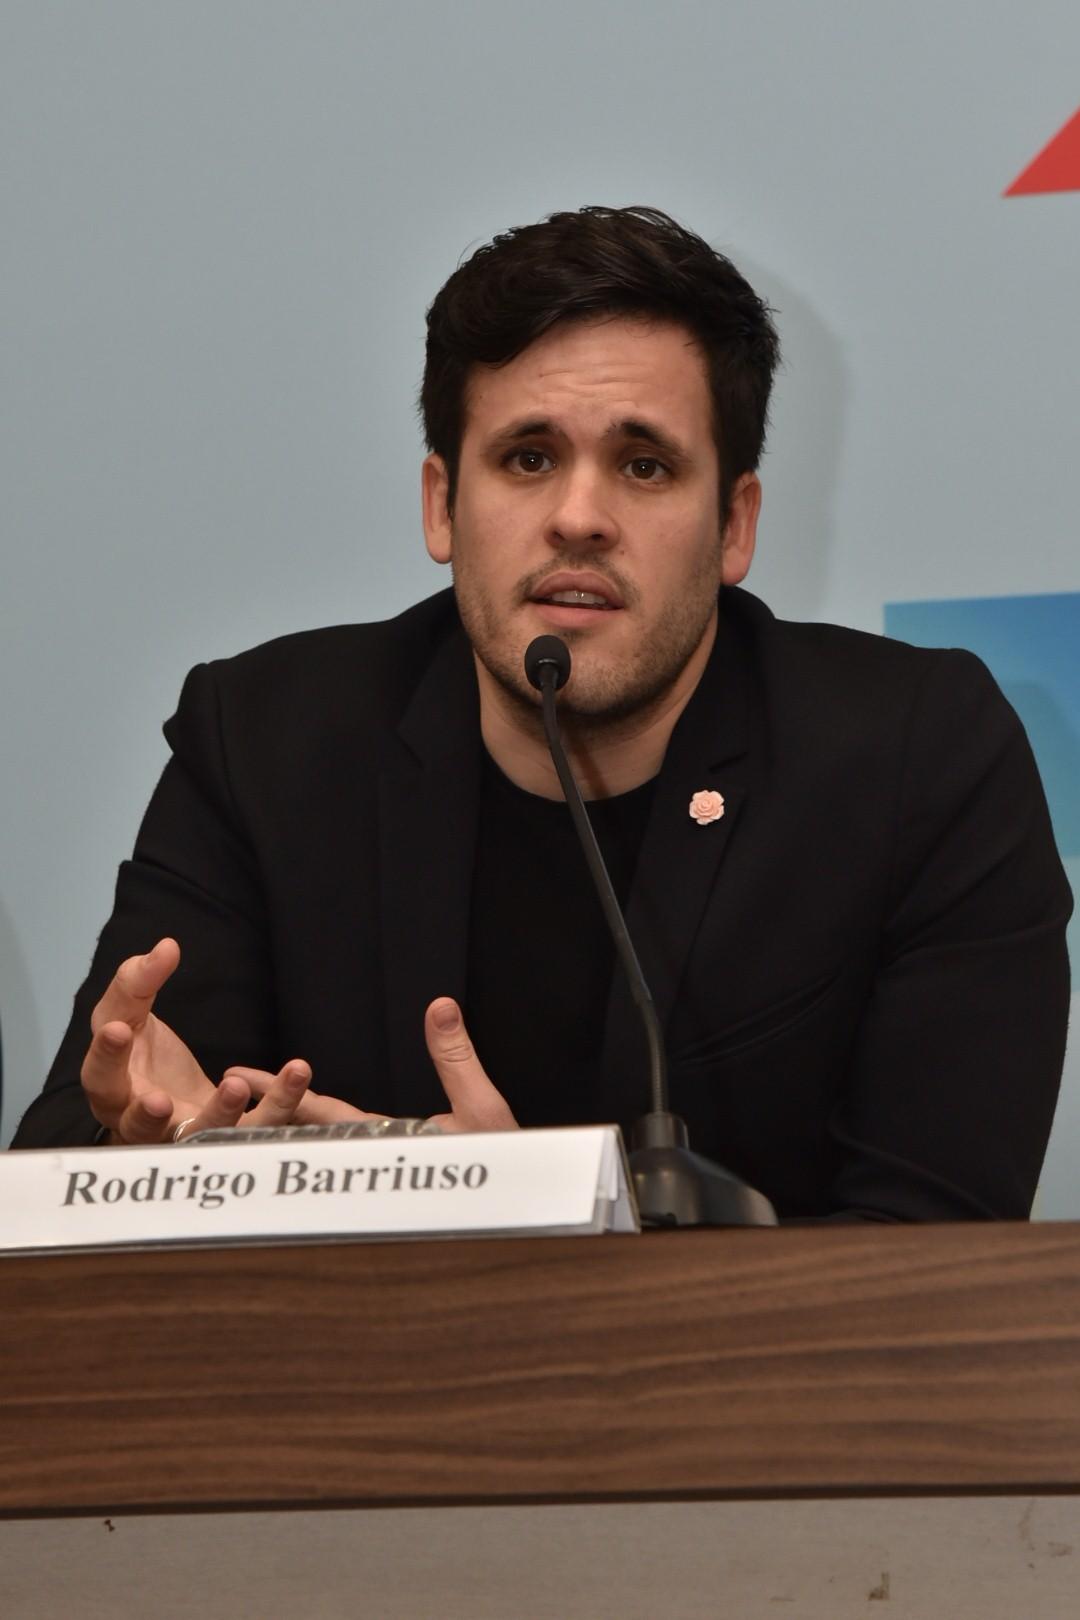 Rodrigo Barrriuso